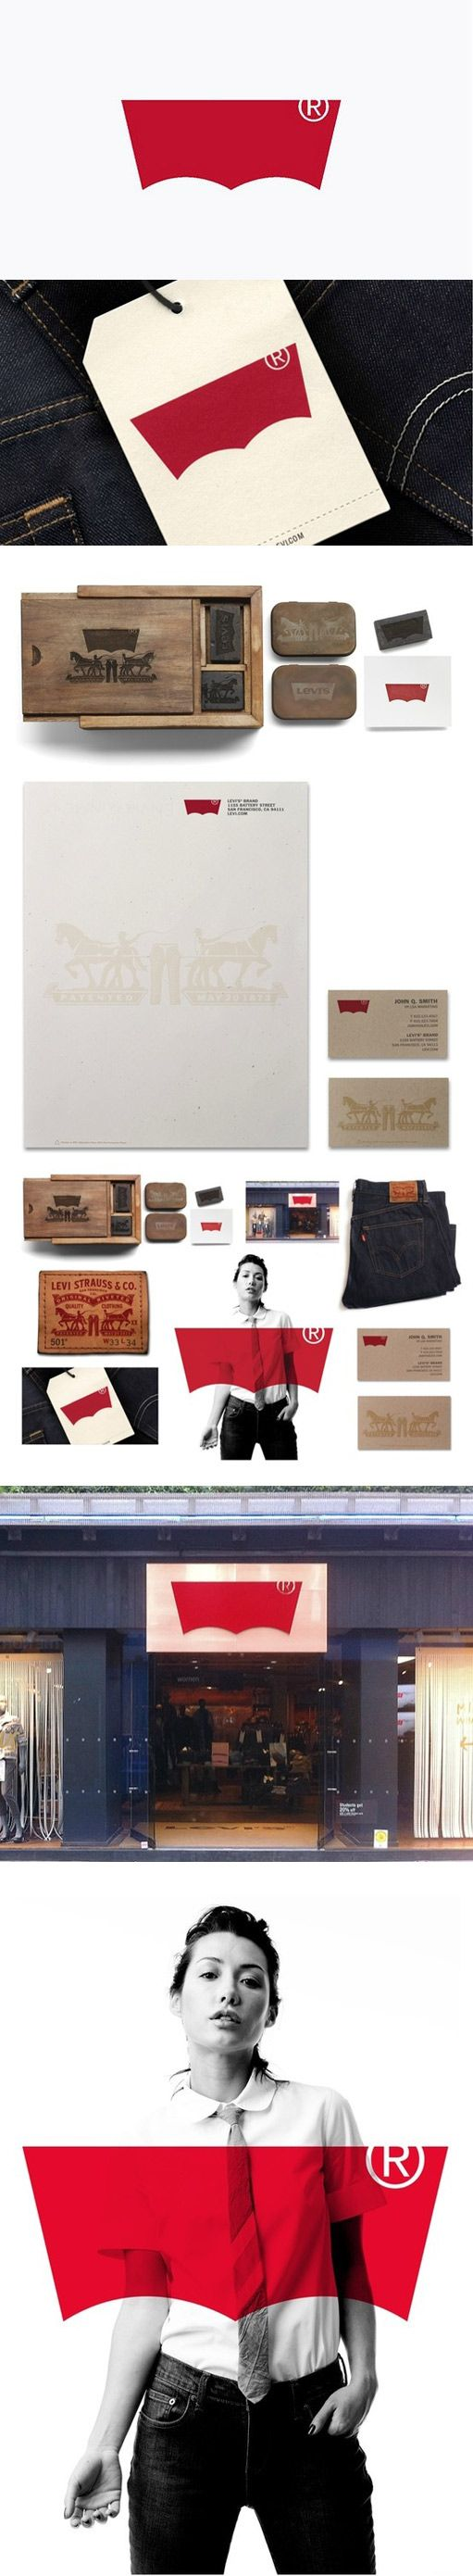 Branding / Levi's Integrated Branding kinda has a #batman graphic no?